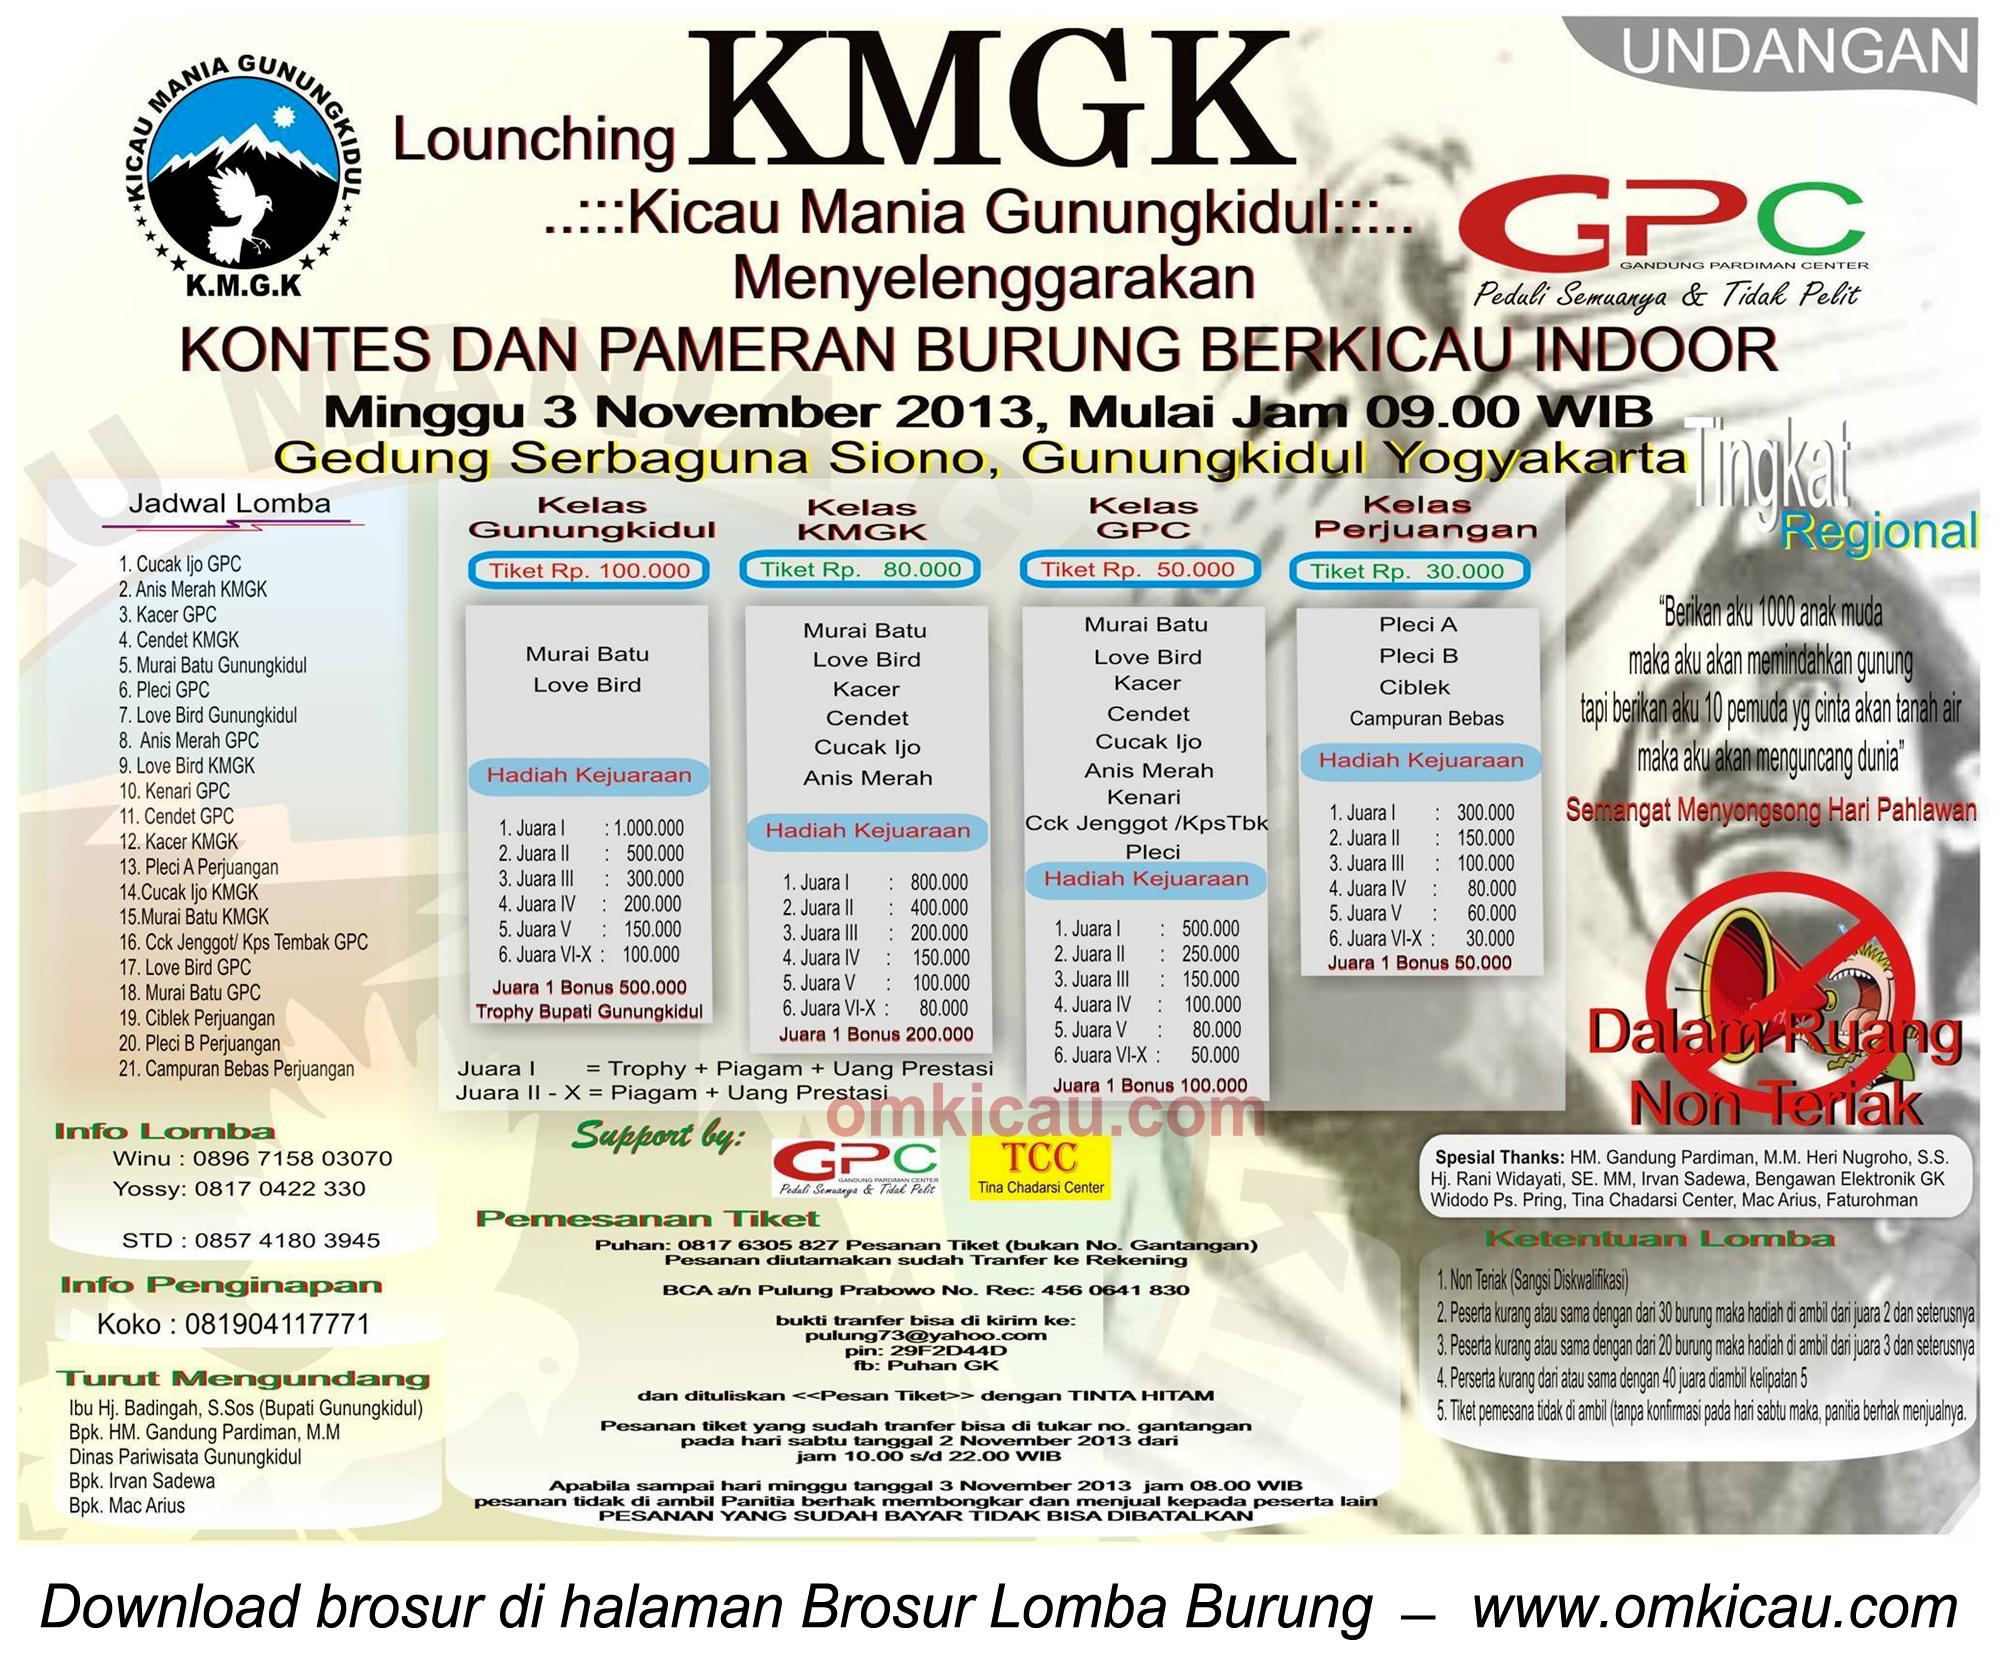 Brosur Lomba Burung Launching KMGK, Gunungkidul, 3 November 2013